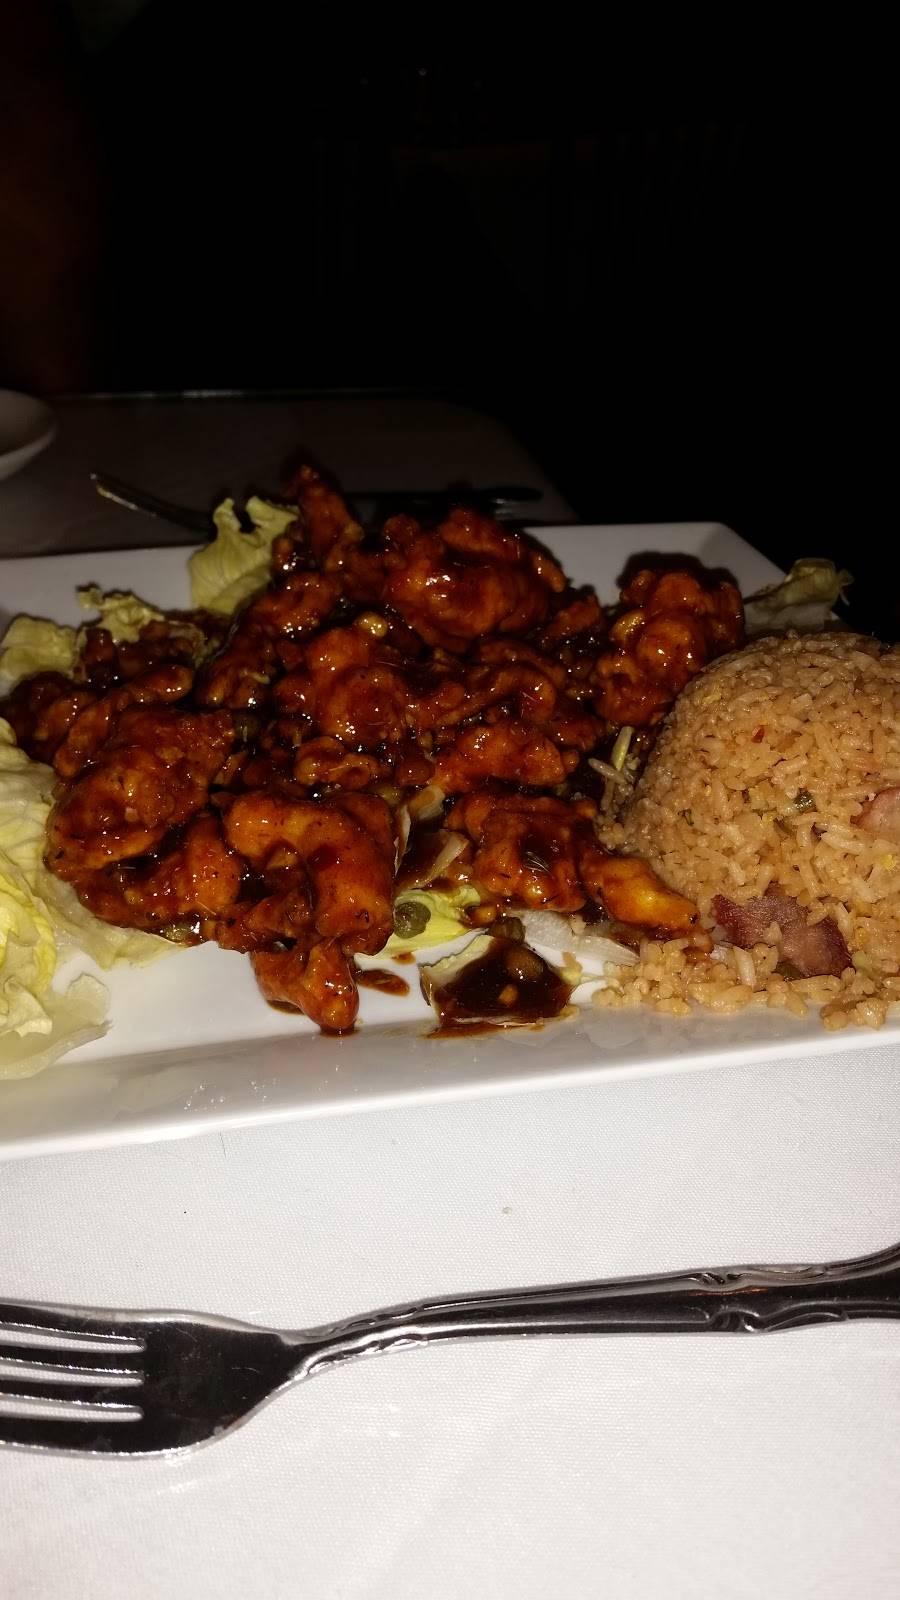 Mencius Gourmet Hunan | restaurant | 1379 Kingwood Dr, Kingwood, TX 77339, USA | 2813598489 OR +1 281-359-8489